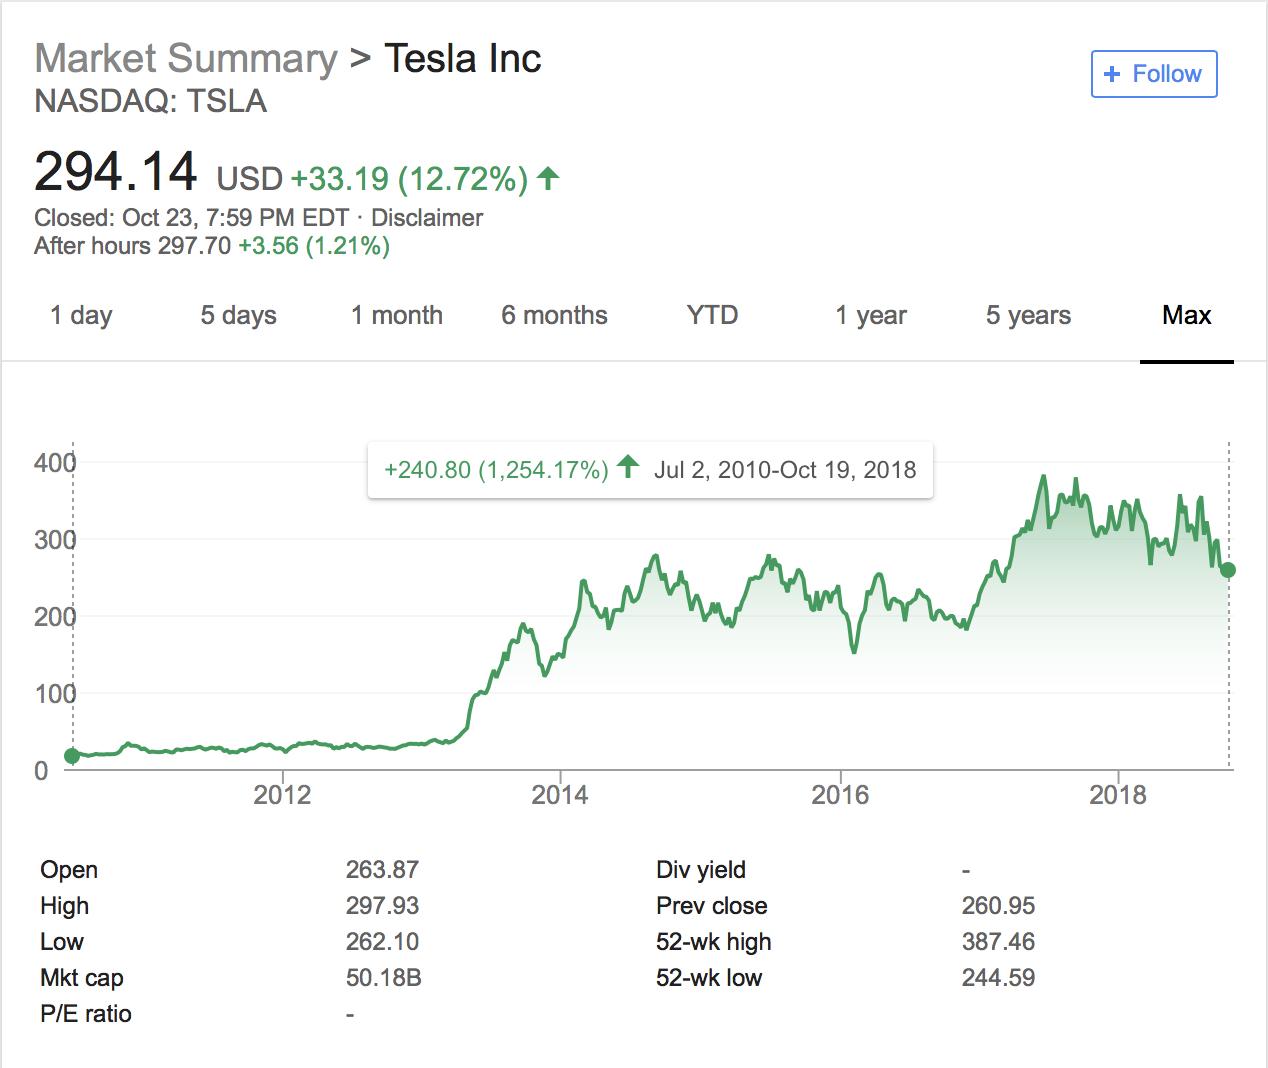 Upgrading Tesla To A Buy, $425 PT On Profitability - Tesla